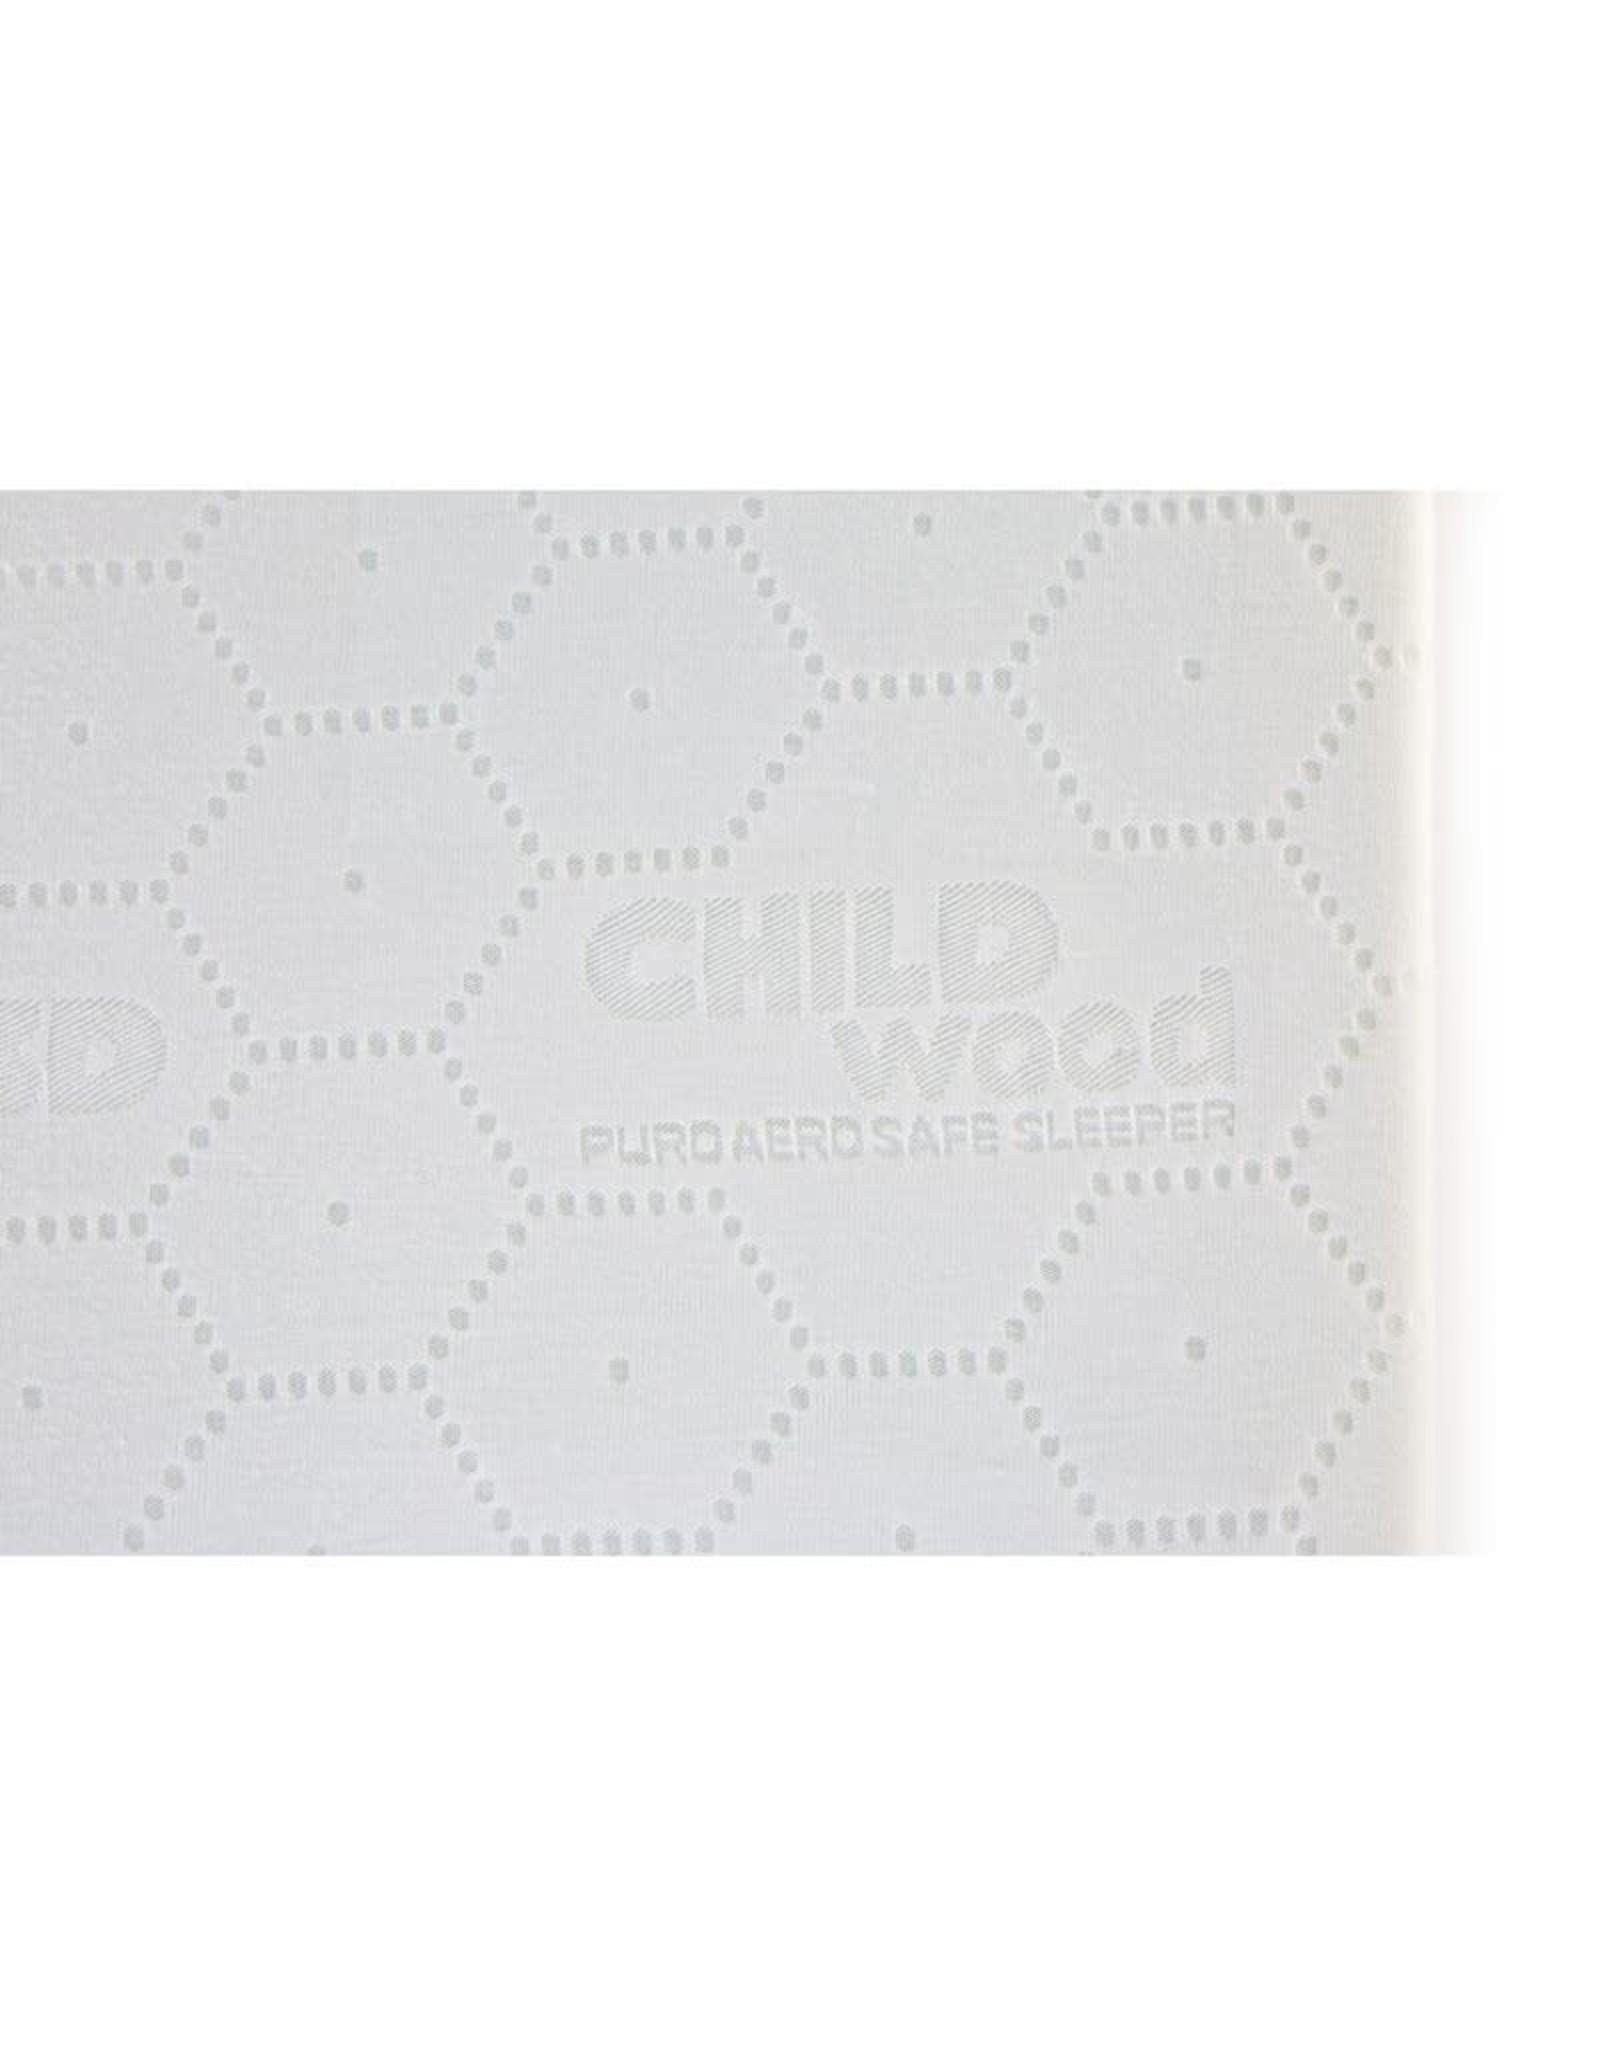 Childhome Childhome Puro Aero Safe Sleeper Matras